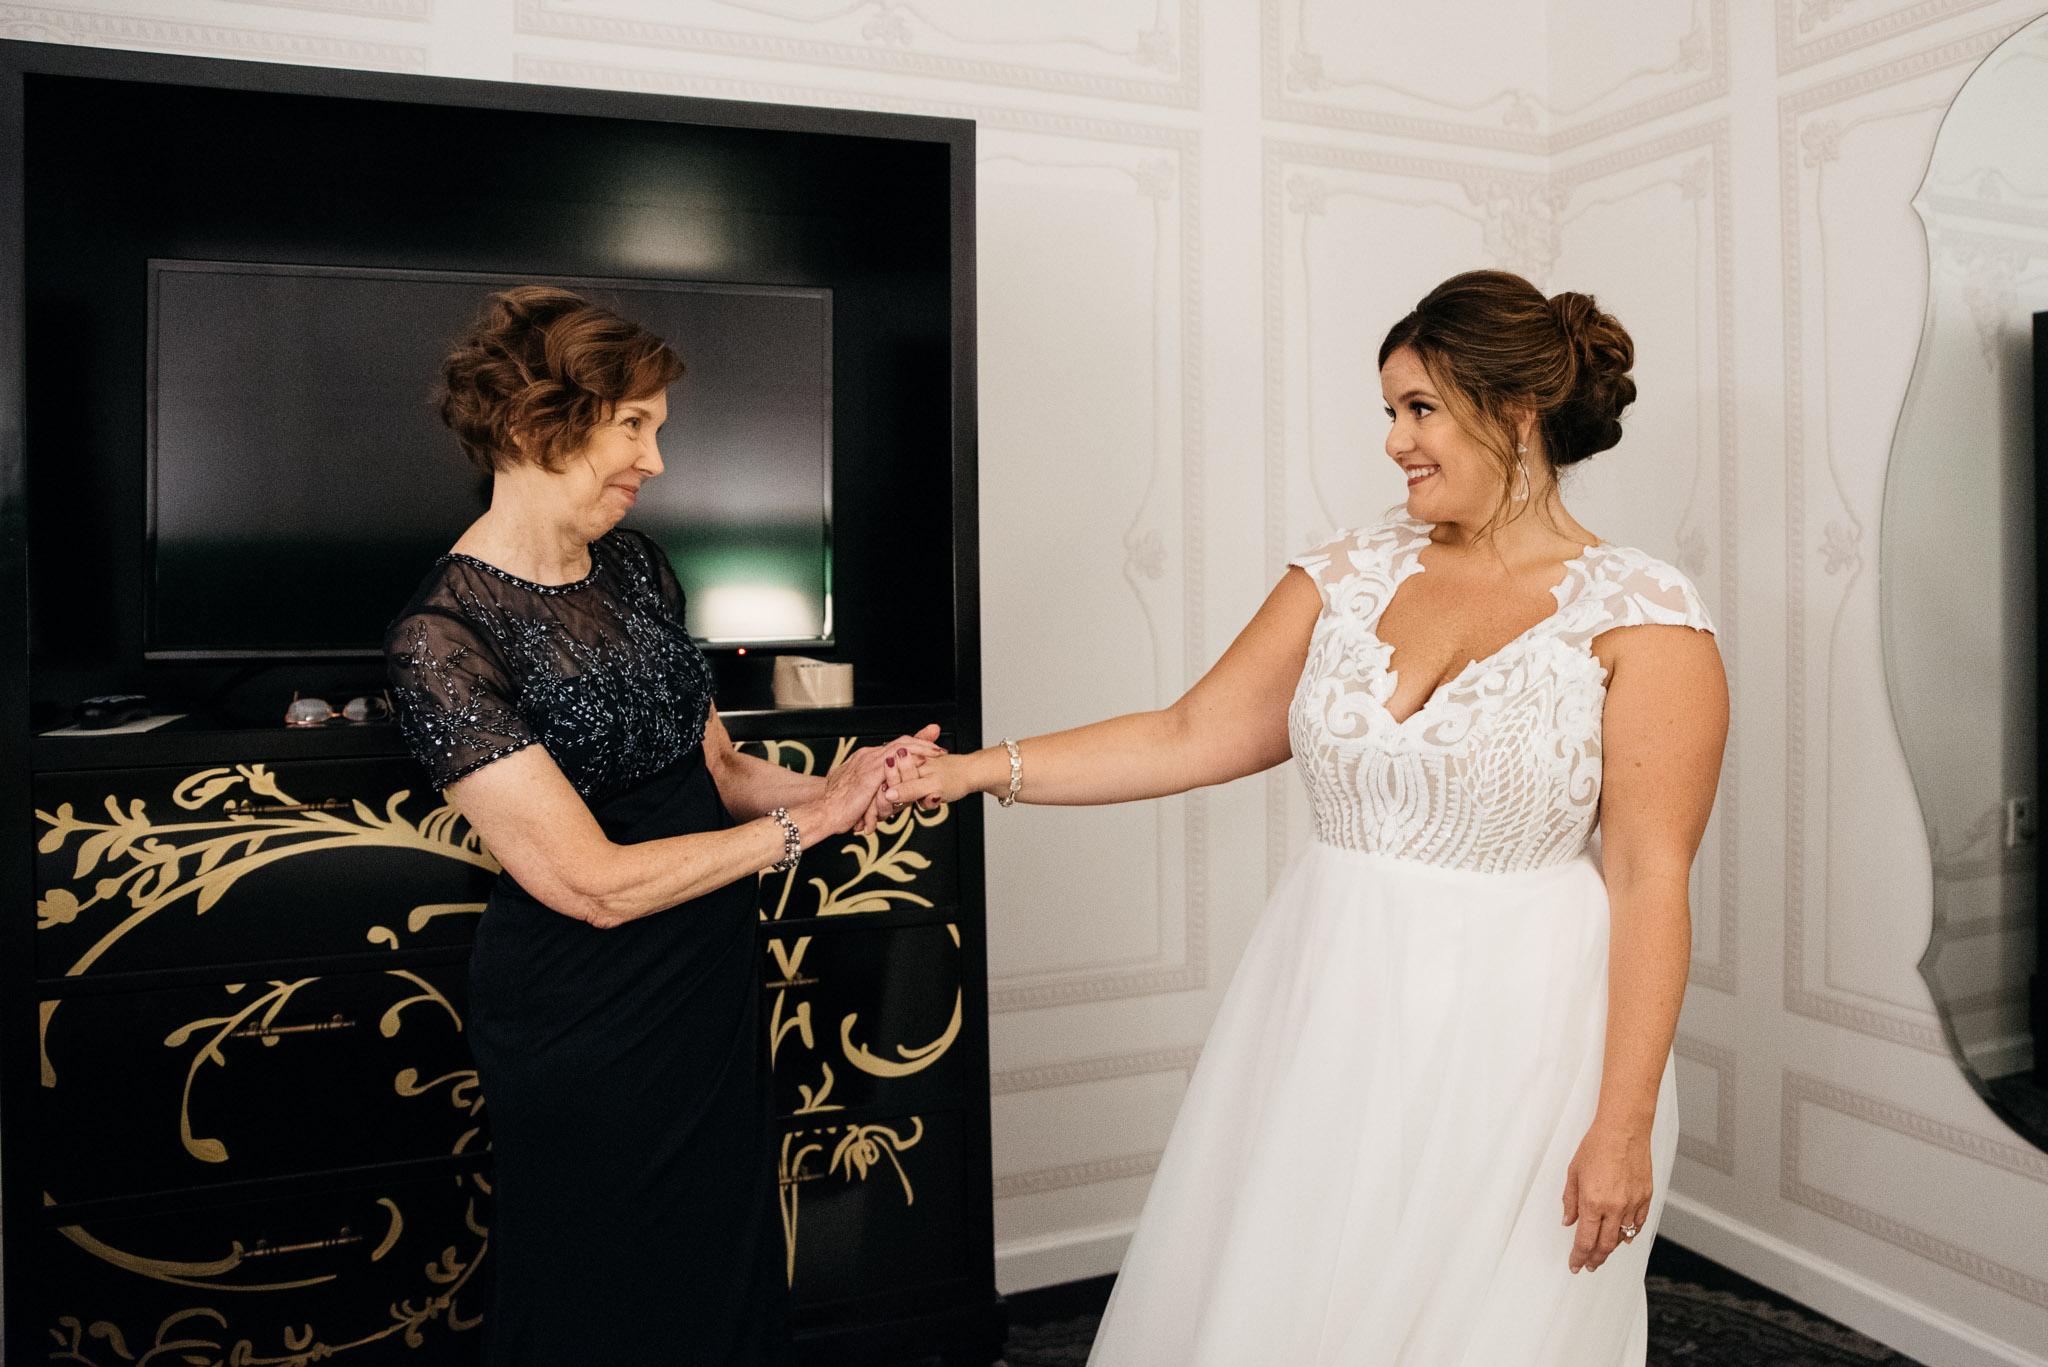 Carnegie Science Center Wedding, getting ready, Hotel Monaco Mariah Fisher Photography-0807.jpg